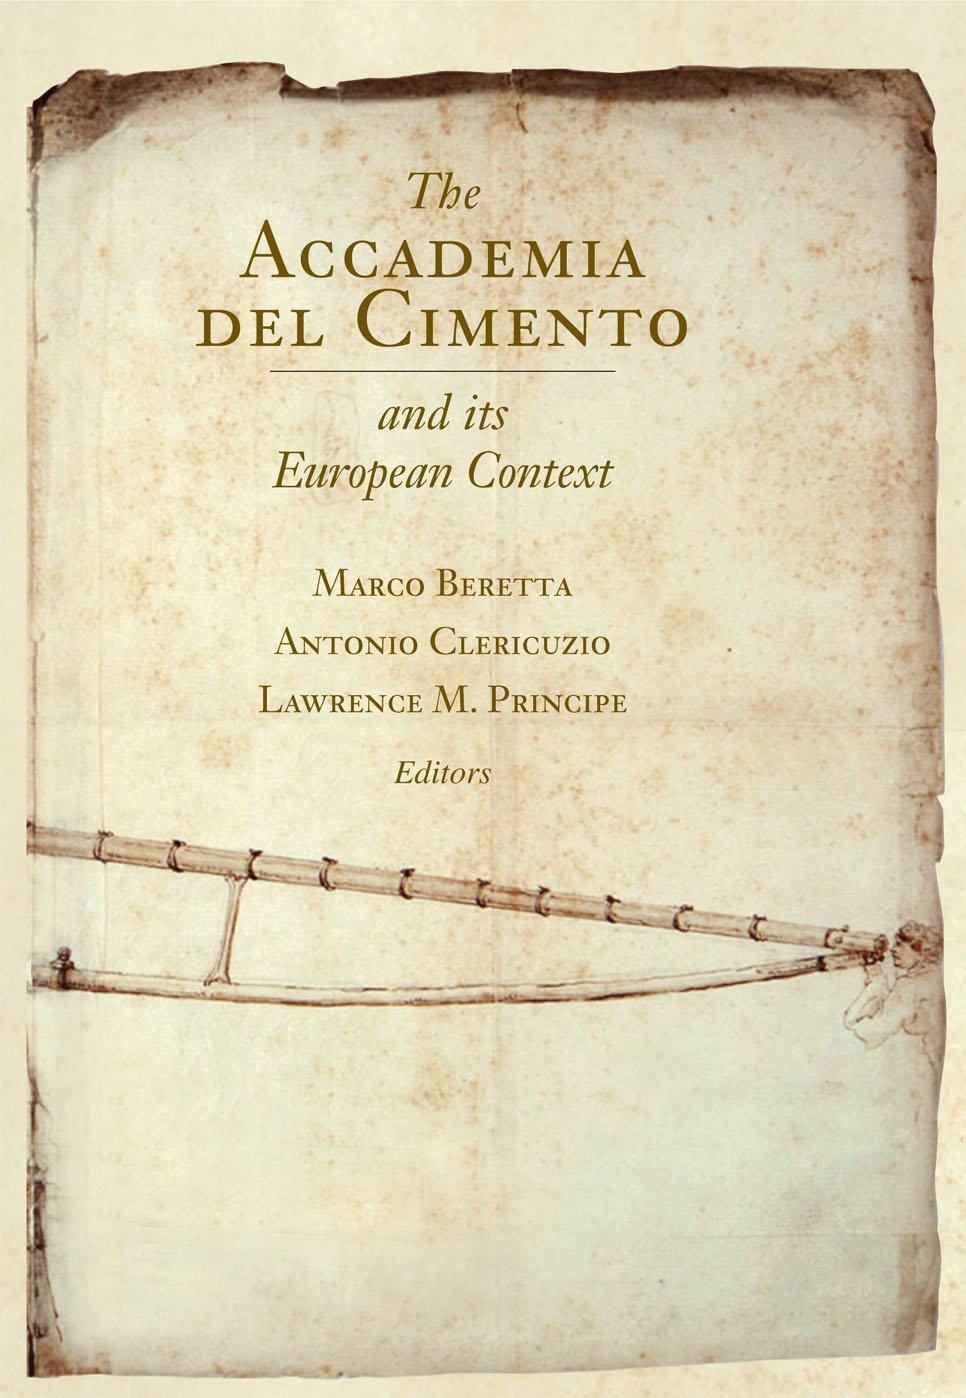 Amazon.it: The Accademia Del Cimento and Its European Context ...